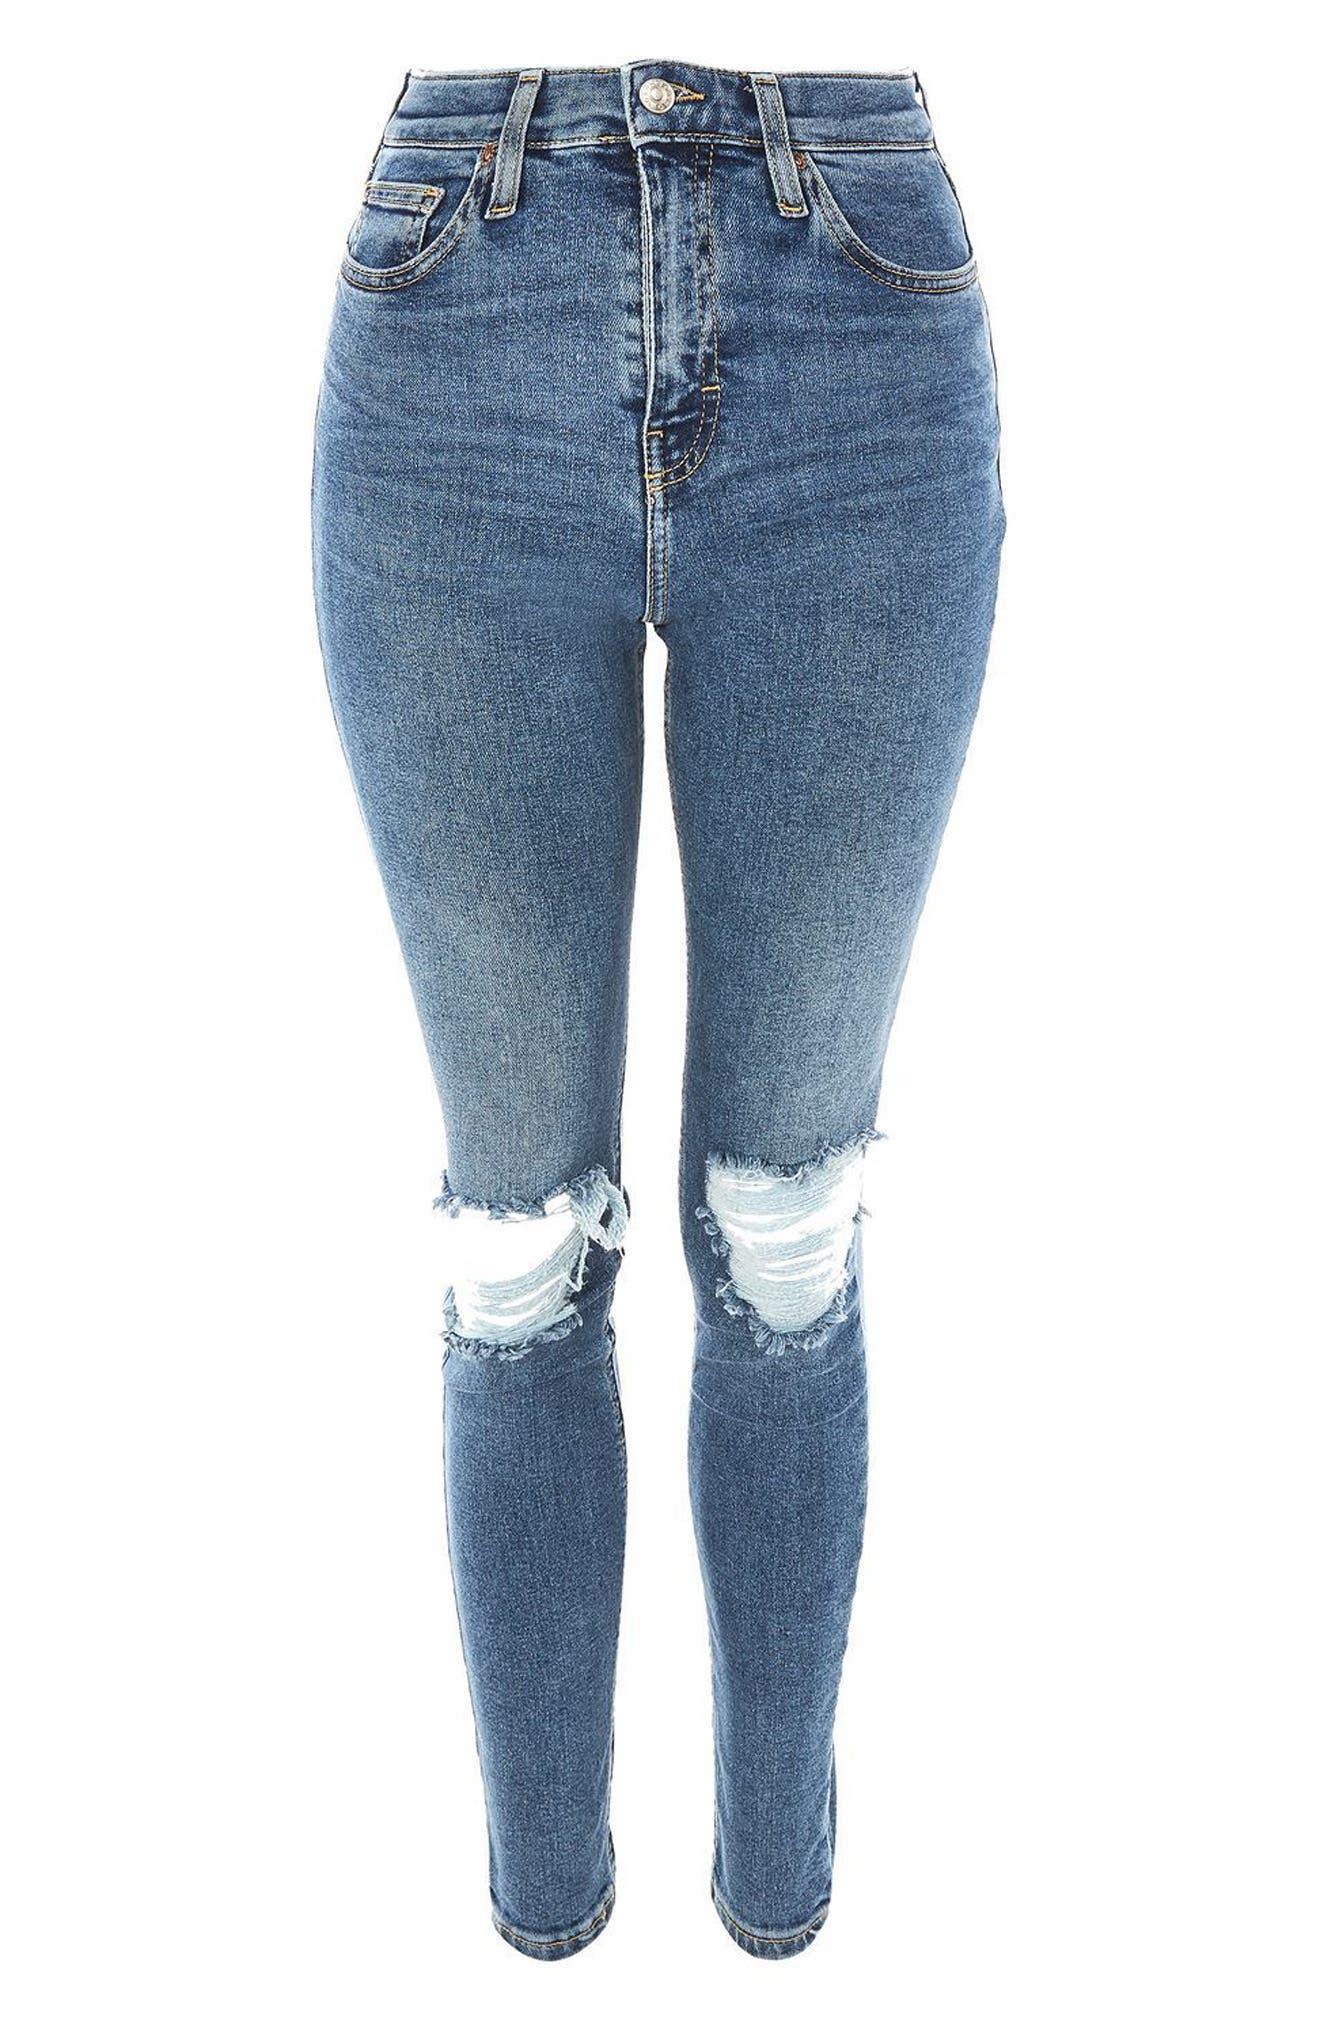 Jamie Rip High Waist Skinny Jeans,                             Alternate thumbnail 3, color,                             400